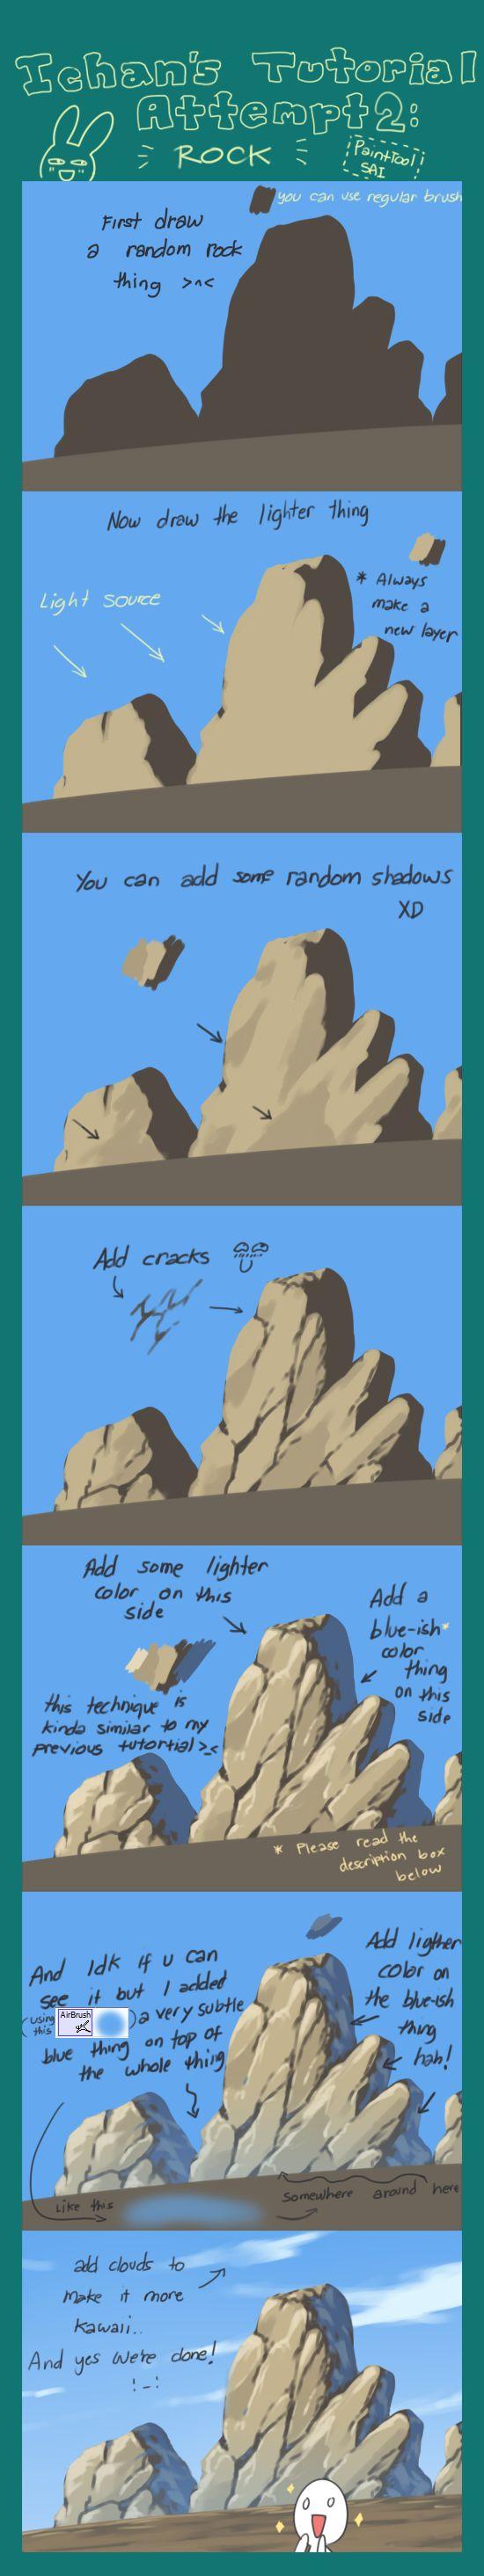 Tutorial Attempt: Rock by ichan-desu on deviantART via PinCG.com